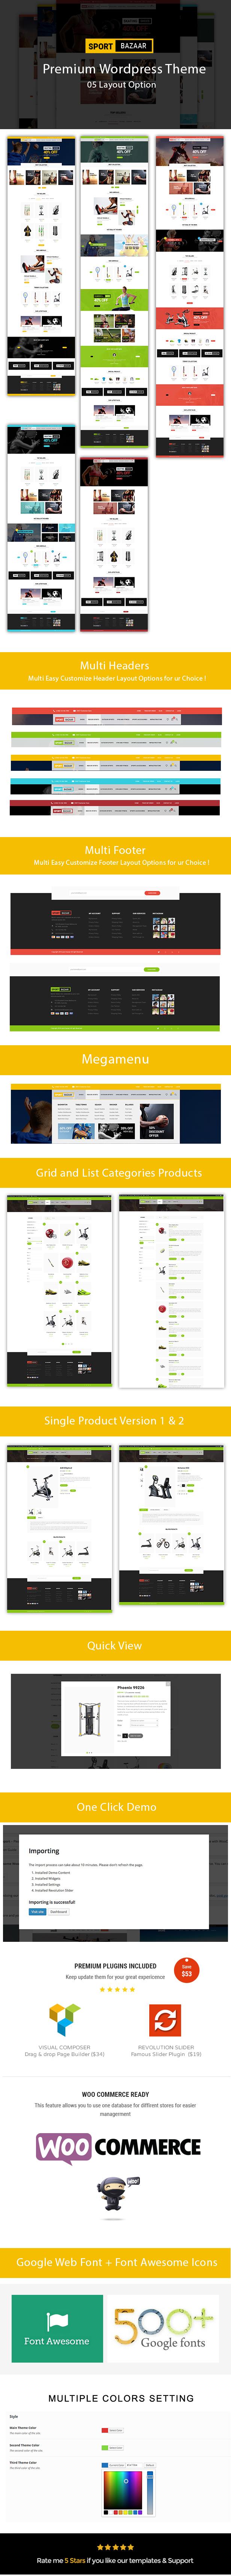 Sport Bazzar - Sports, Fitness and Gym Responsive WooCommerce WordPress Theme - 1